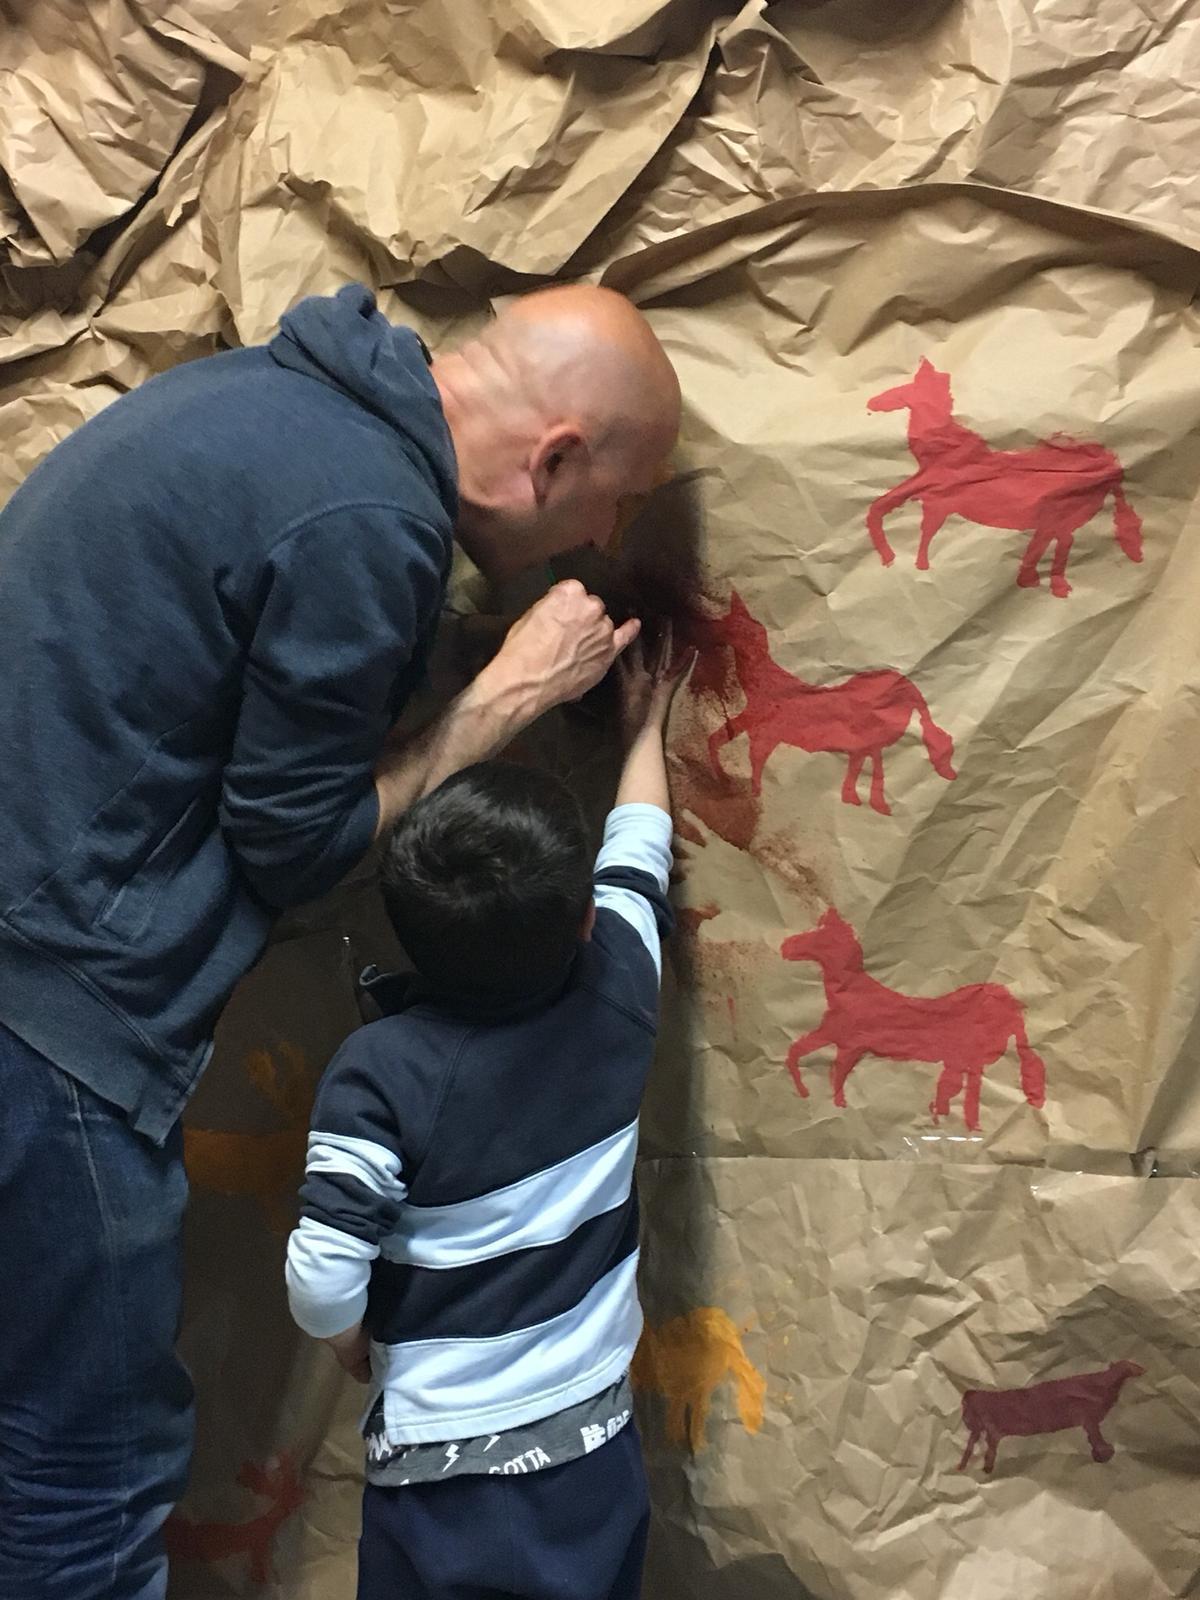 2019_03_15_Infantil 4B descubre la pintura rupestre_CEIP FDLR_Las Rozas 9